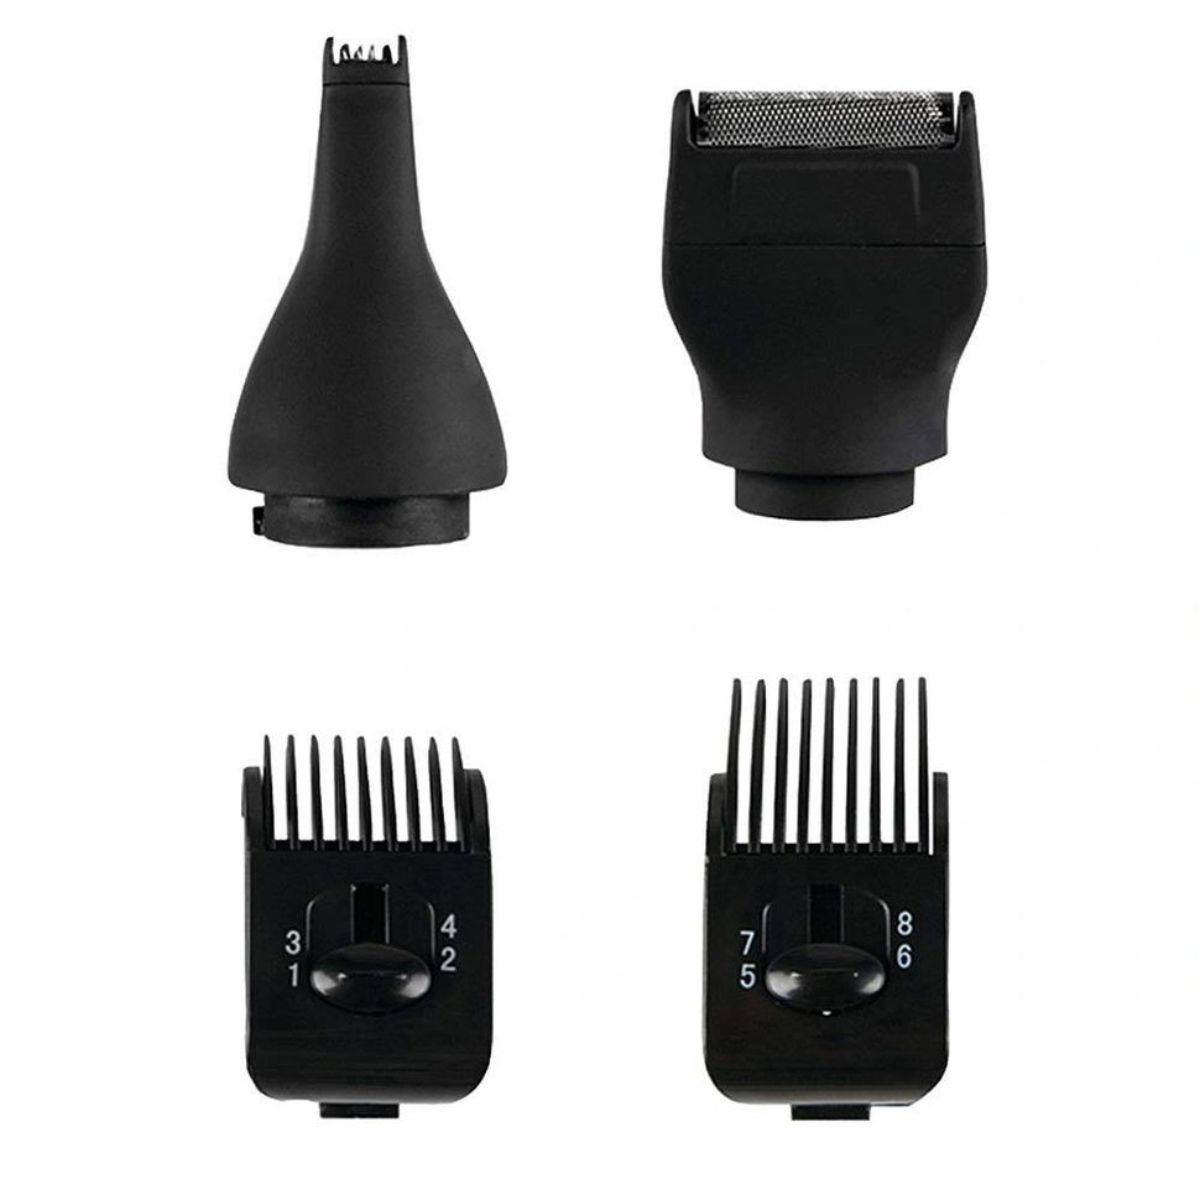 kit de afeitado 2 1